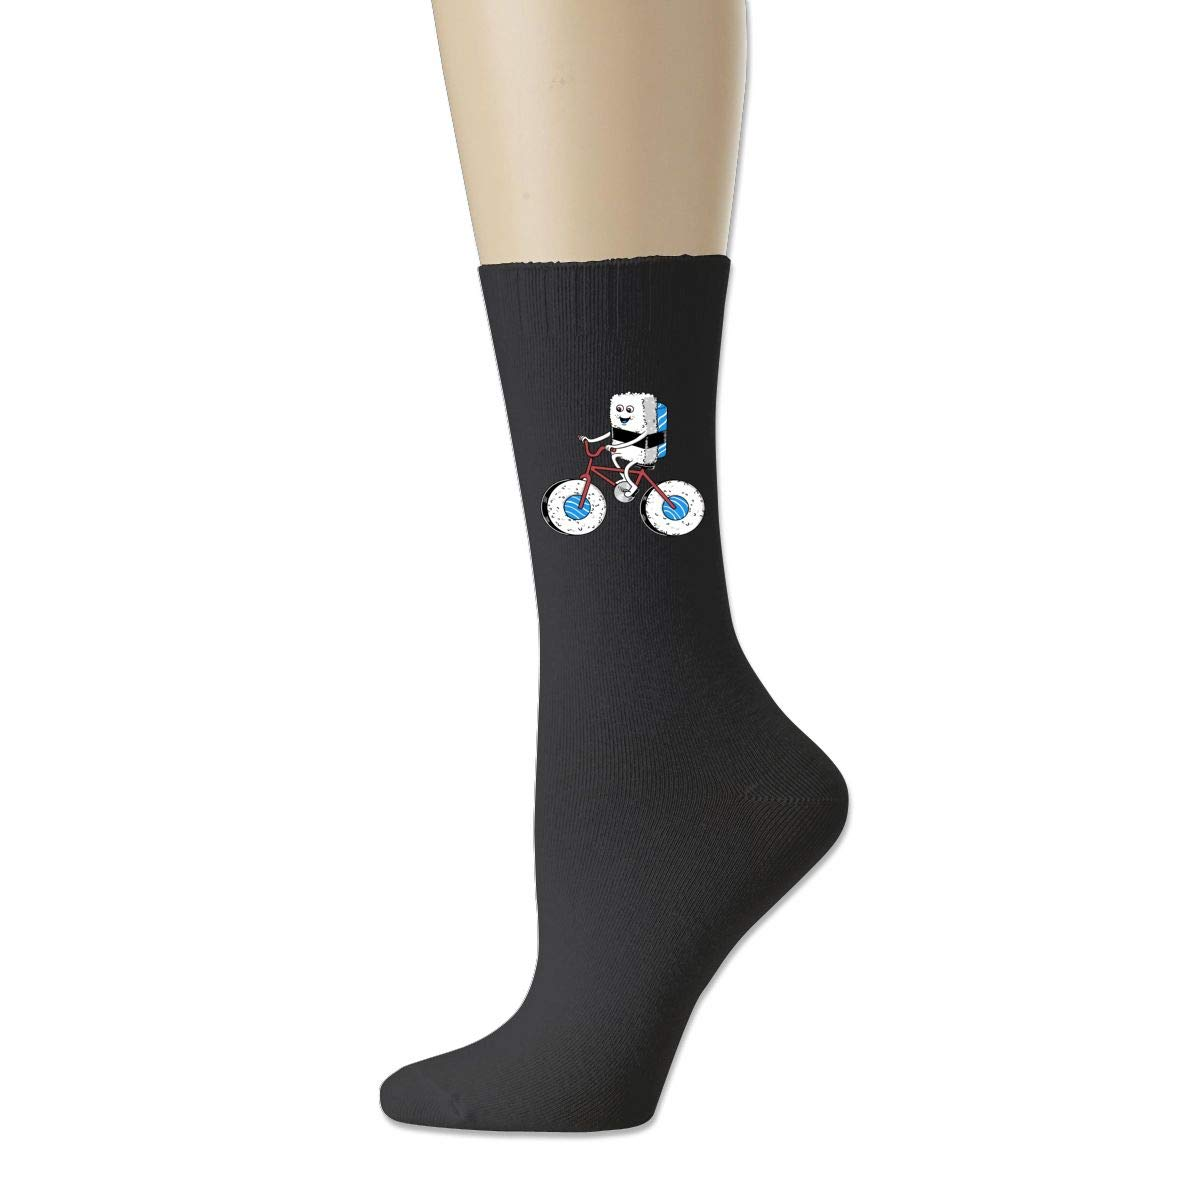 Rigg-socks Sushi Bicycle Mens Comfortable Sport Socks Gray